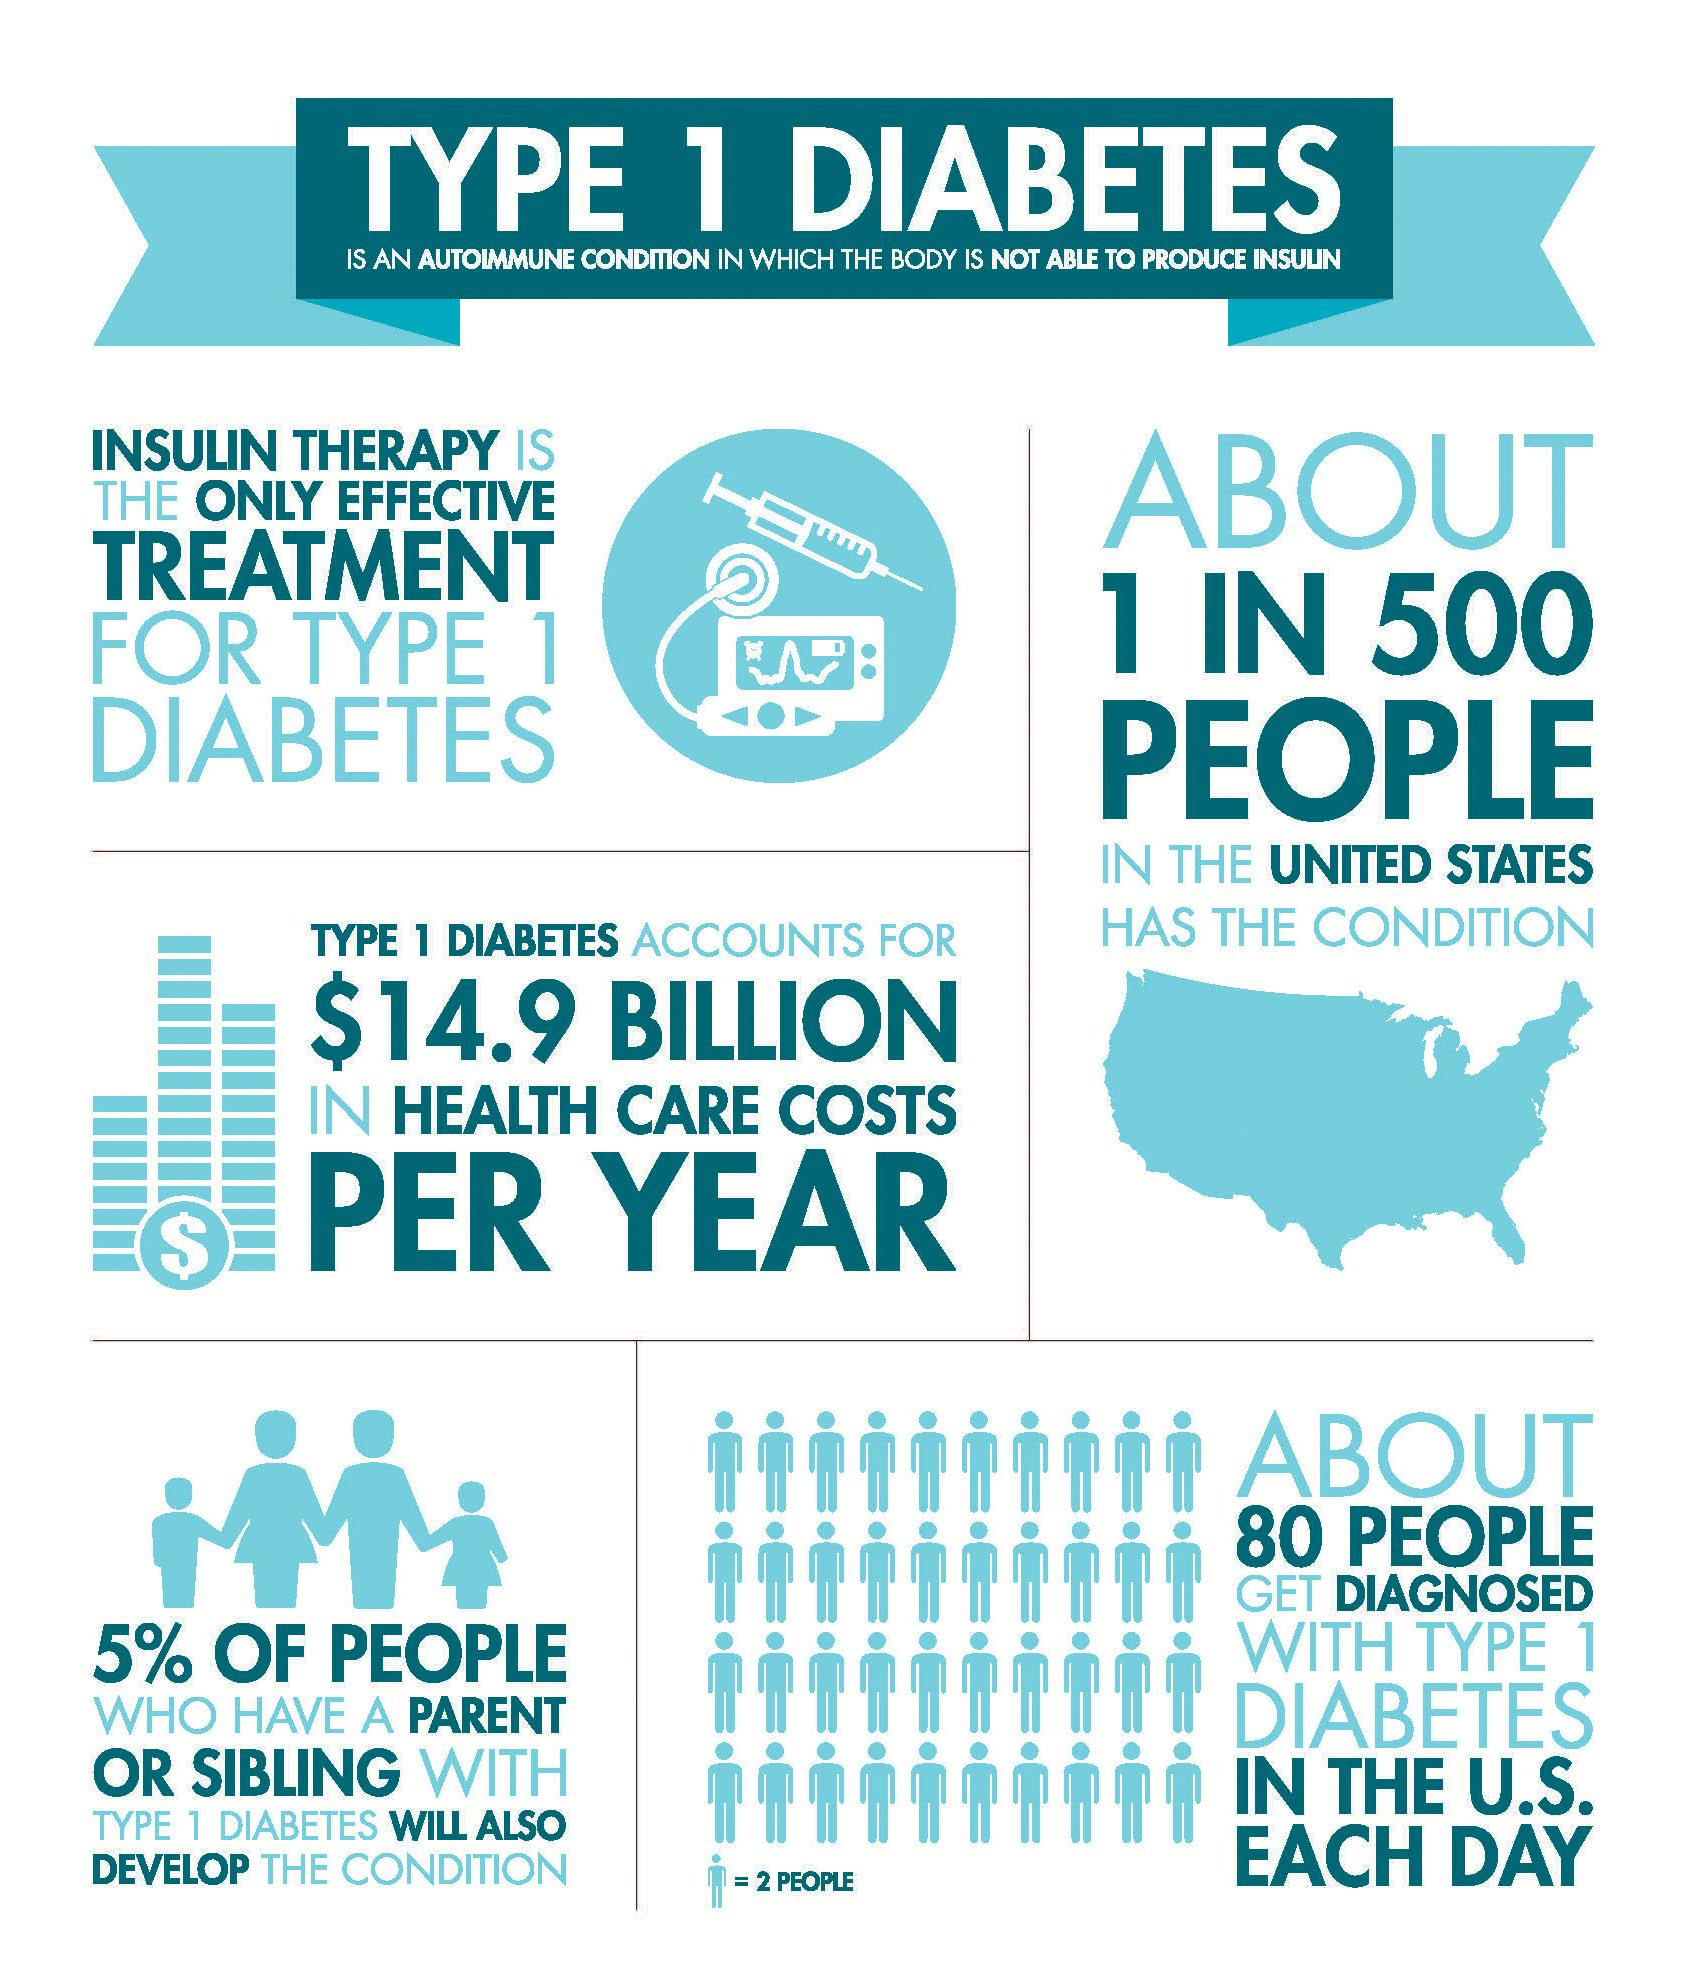 Diabetes: You are NOT alone. General Diabetes Statistics - Gluxus Health -  COMFORTAID